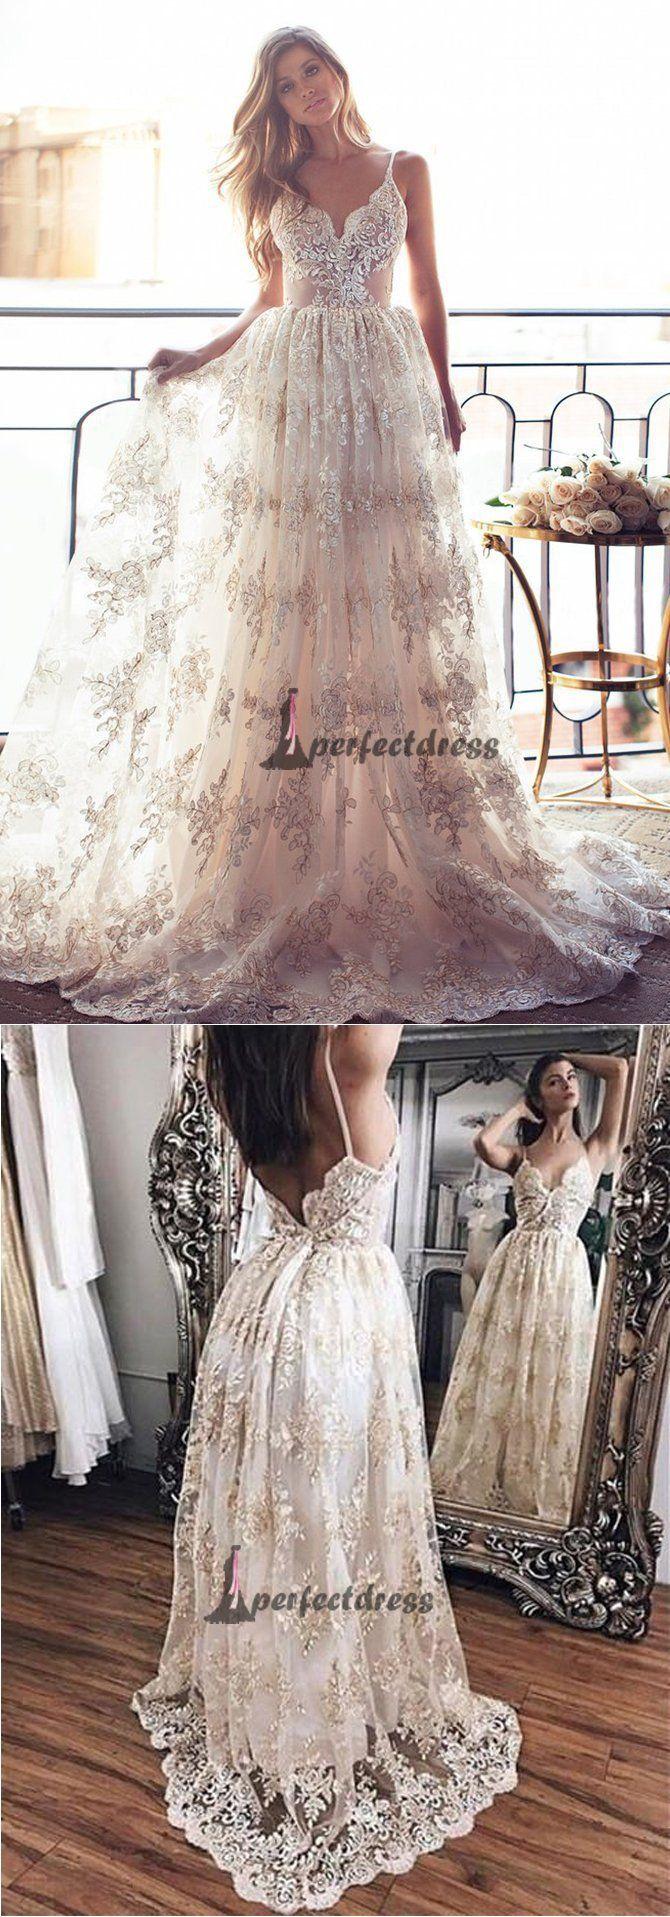 Prom dresses lace backless sexy prom dressespd dress lace